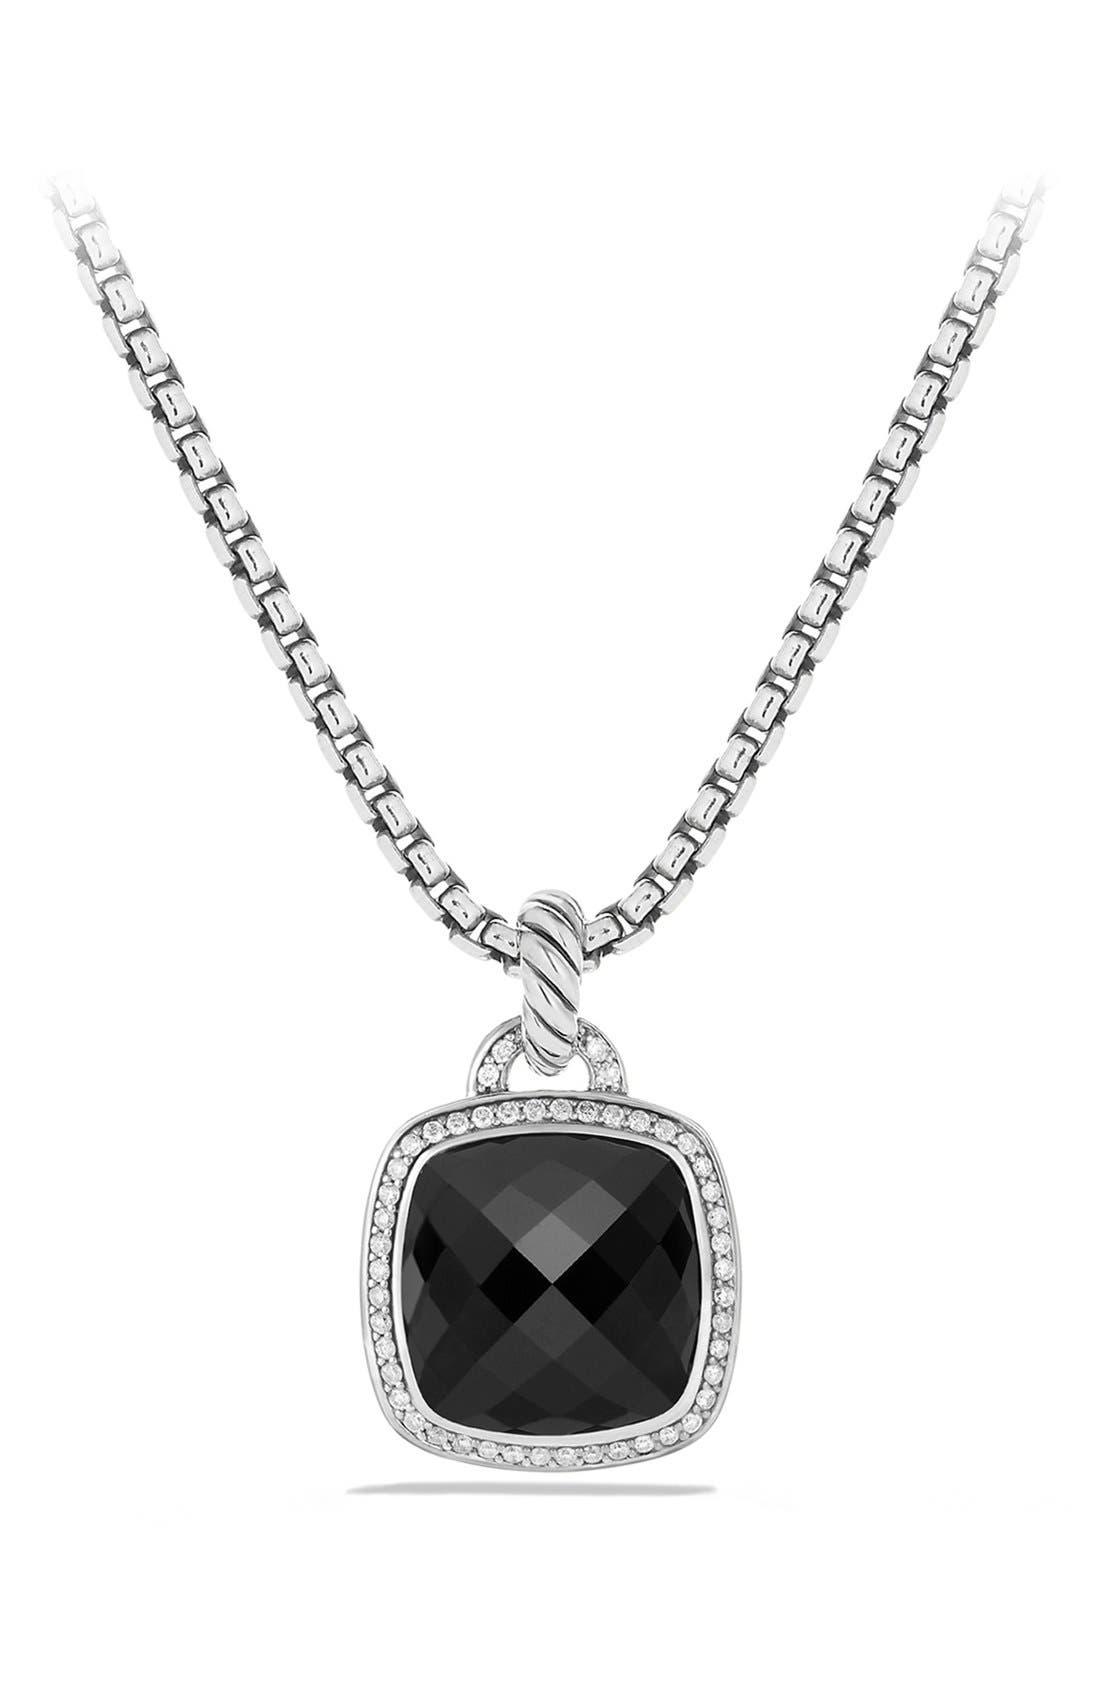 Main Image - David Yurman 'Albion' Pendant with Semiprecious Stone and Diamonds